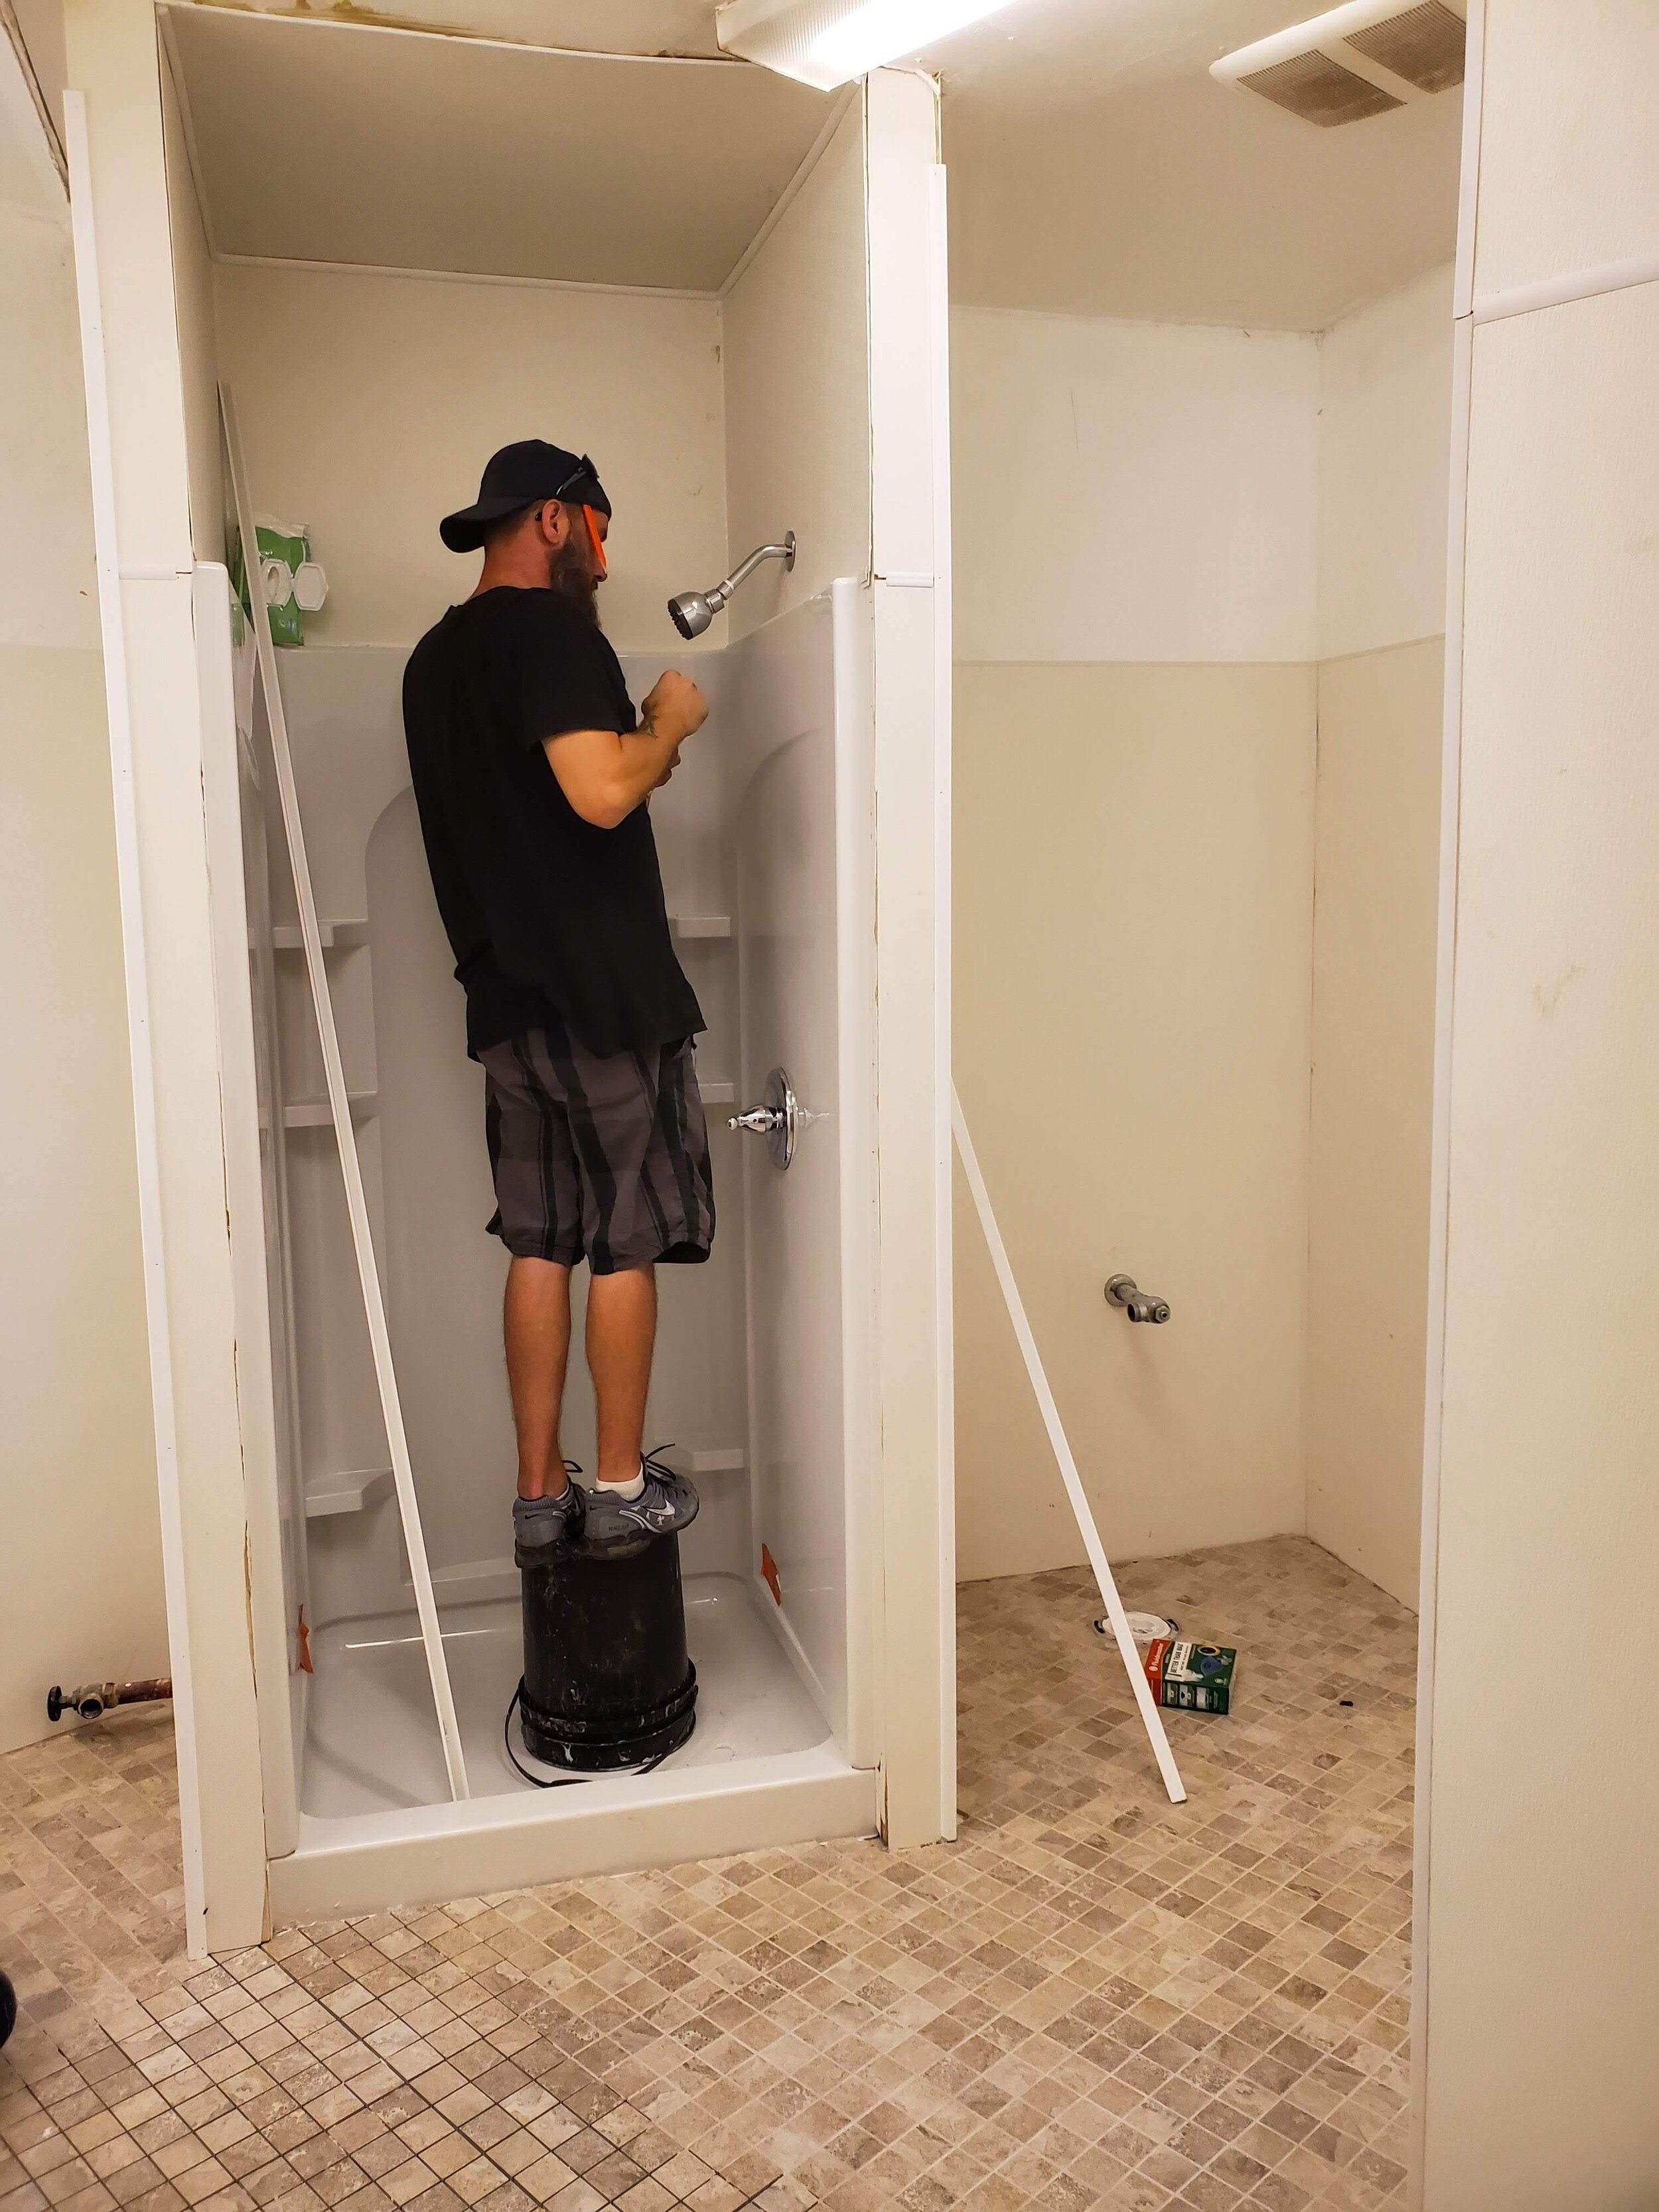 2019 First Floor Bathroom Renovation 20190815_104529.jpg